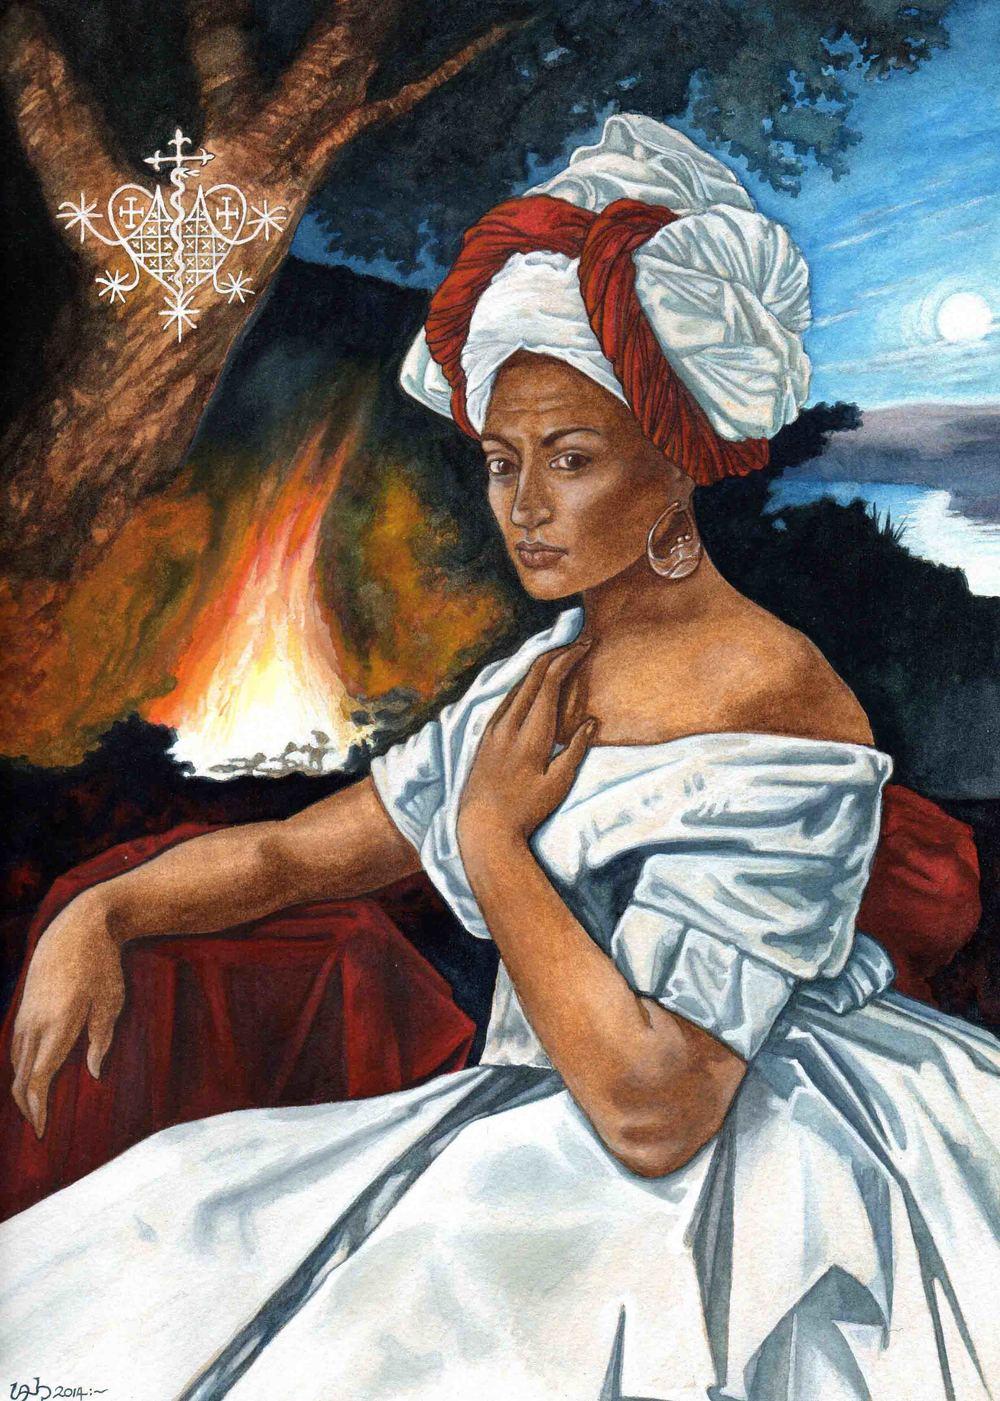 The Fires of St. John. Marie Laveau - 2014